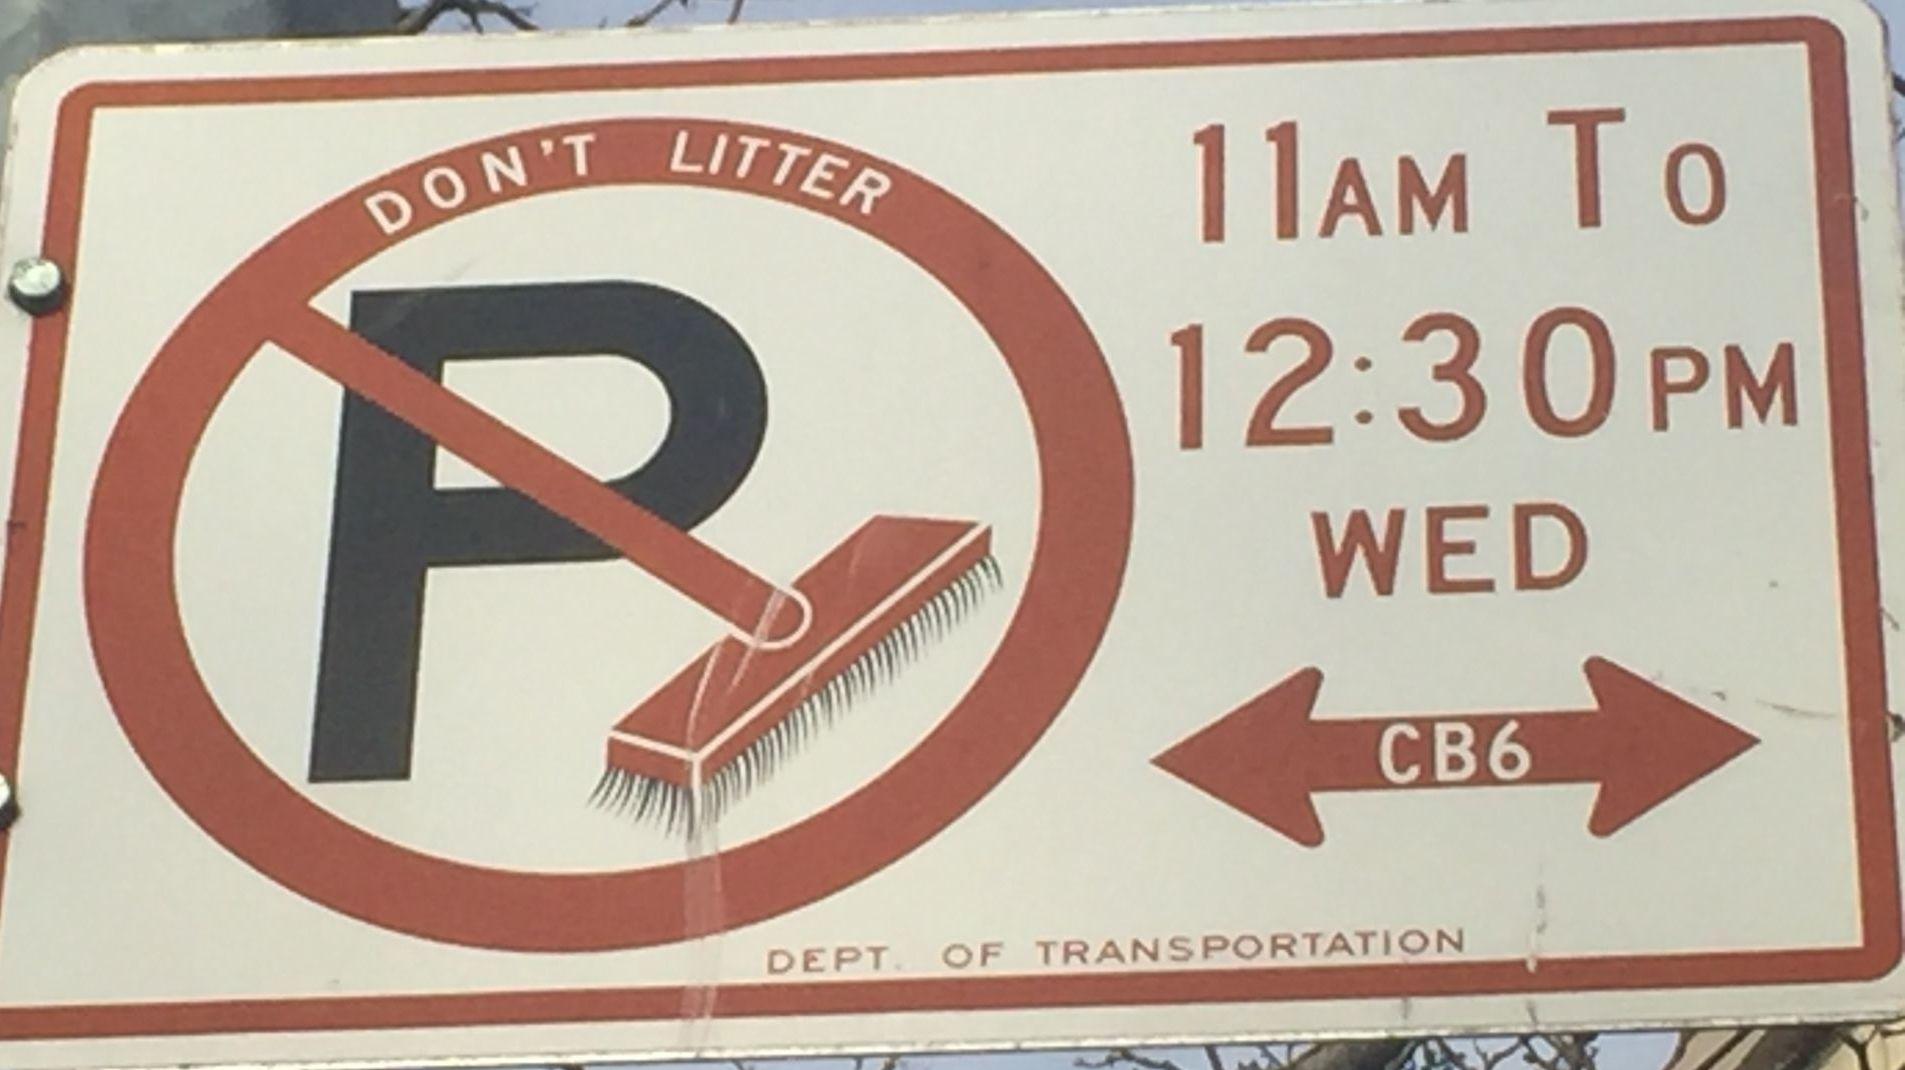 Holidays That Suspend Alternate Side Parking In Nyc with regard to Nyc Alternate Side Parking Calendar 2020